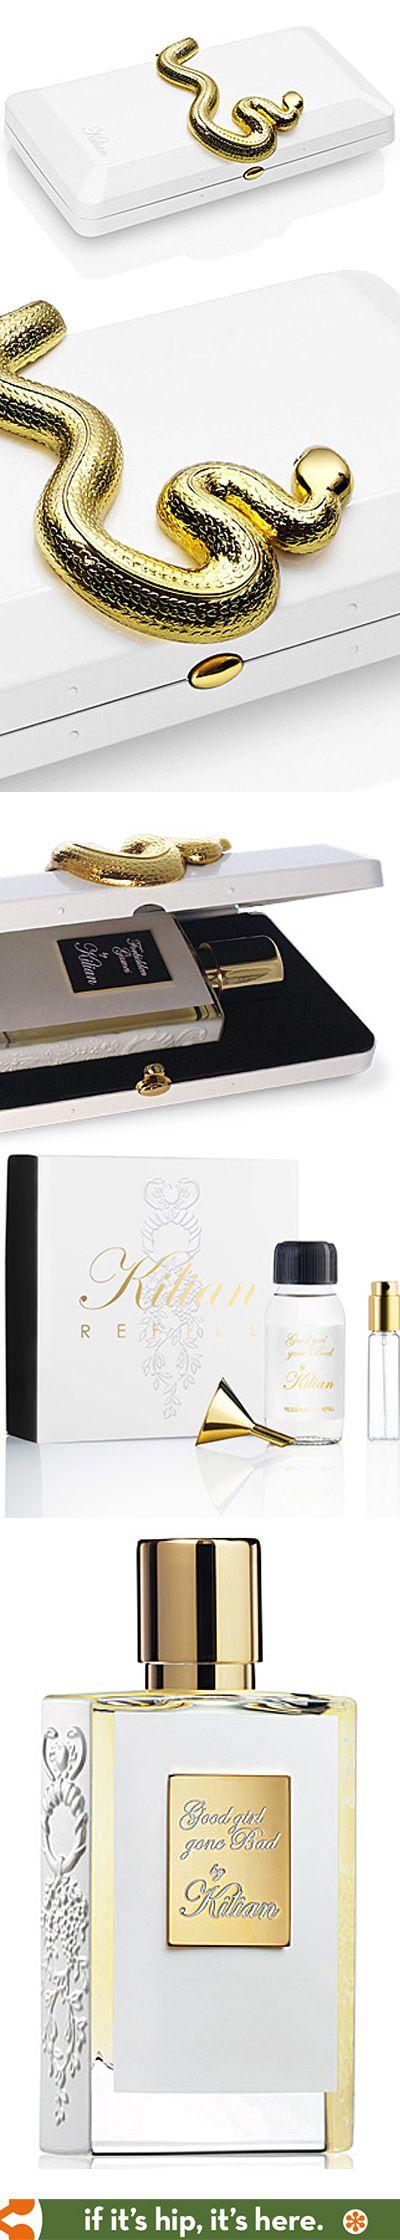 Kilian's Good Girl Gone Bad perfume in snake adorned box with refill.